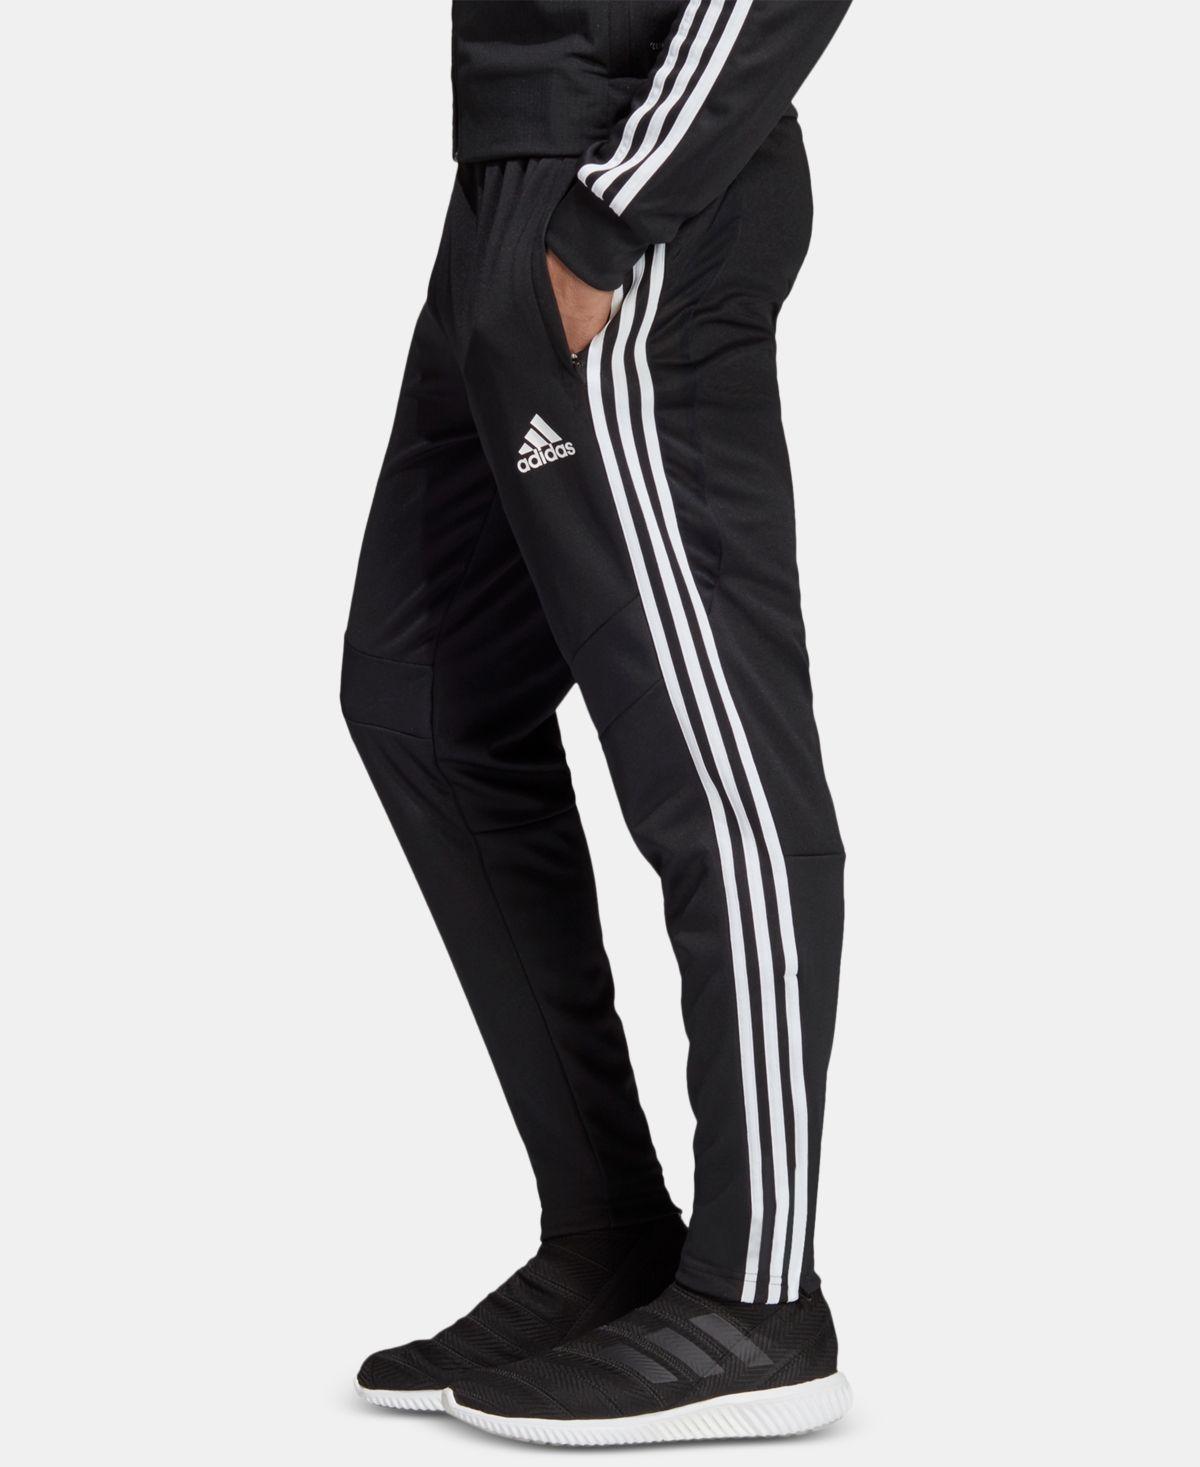 adidas pants all black